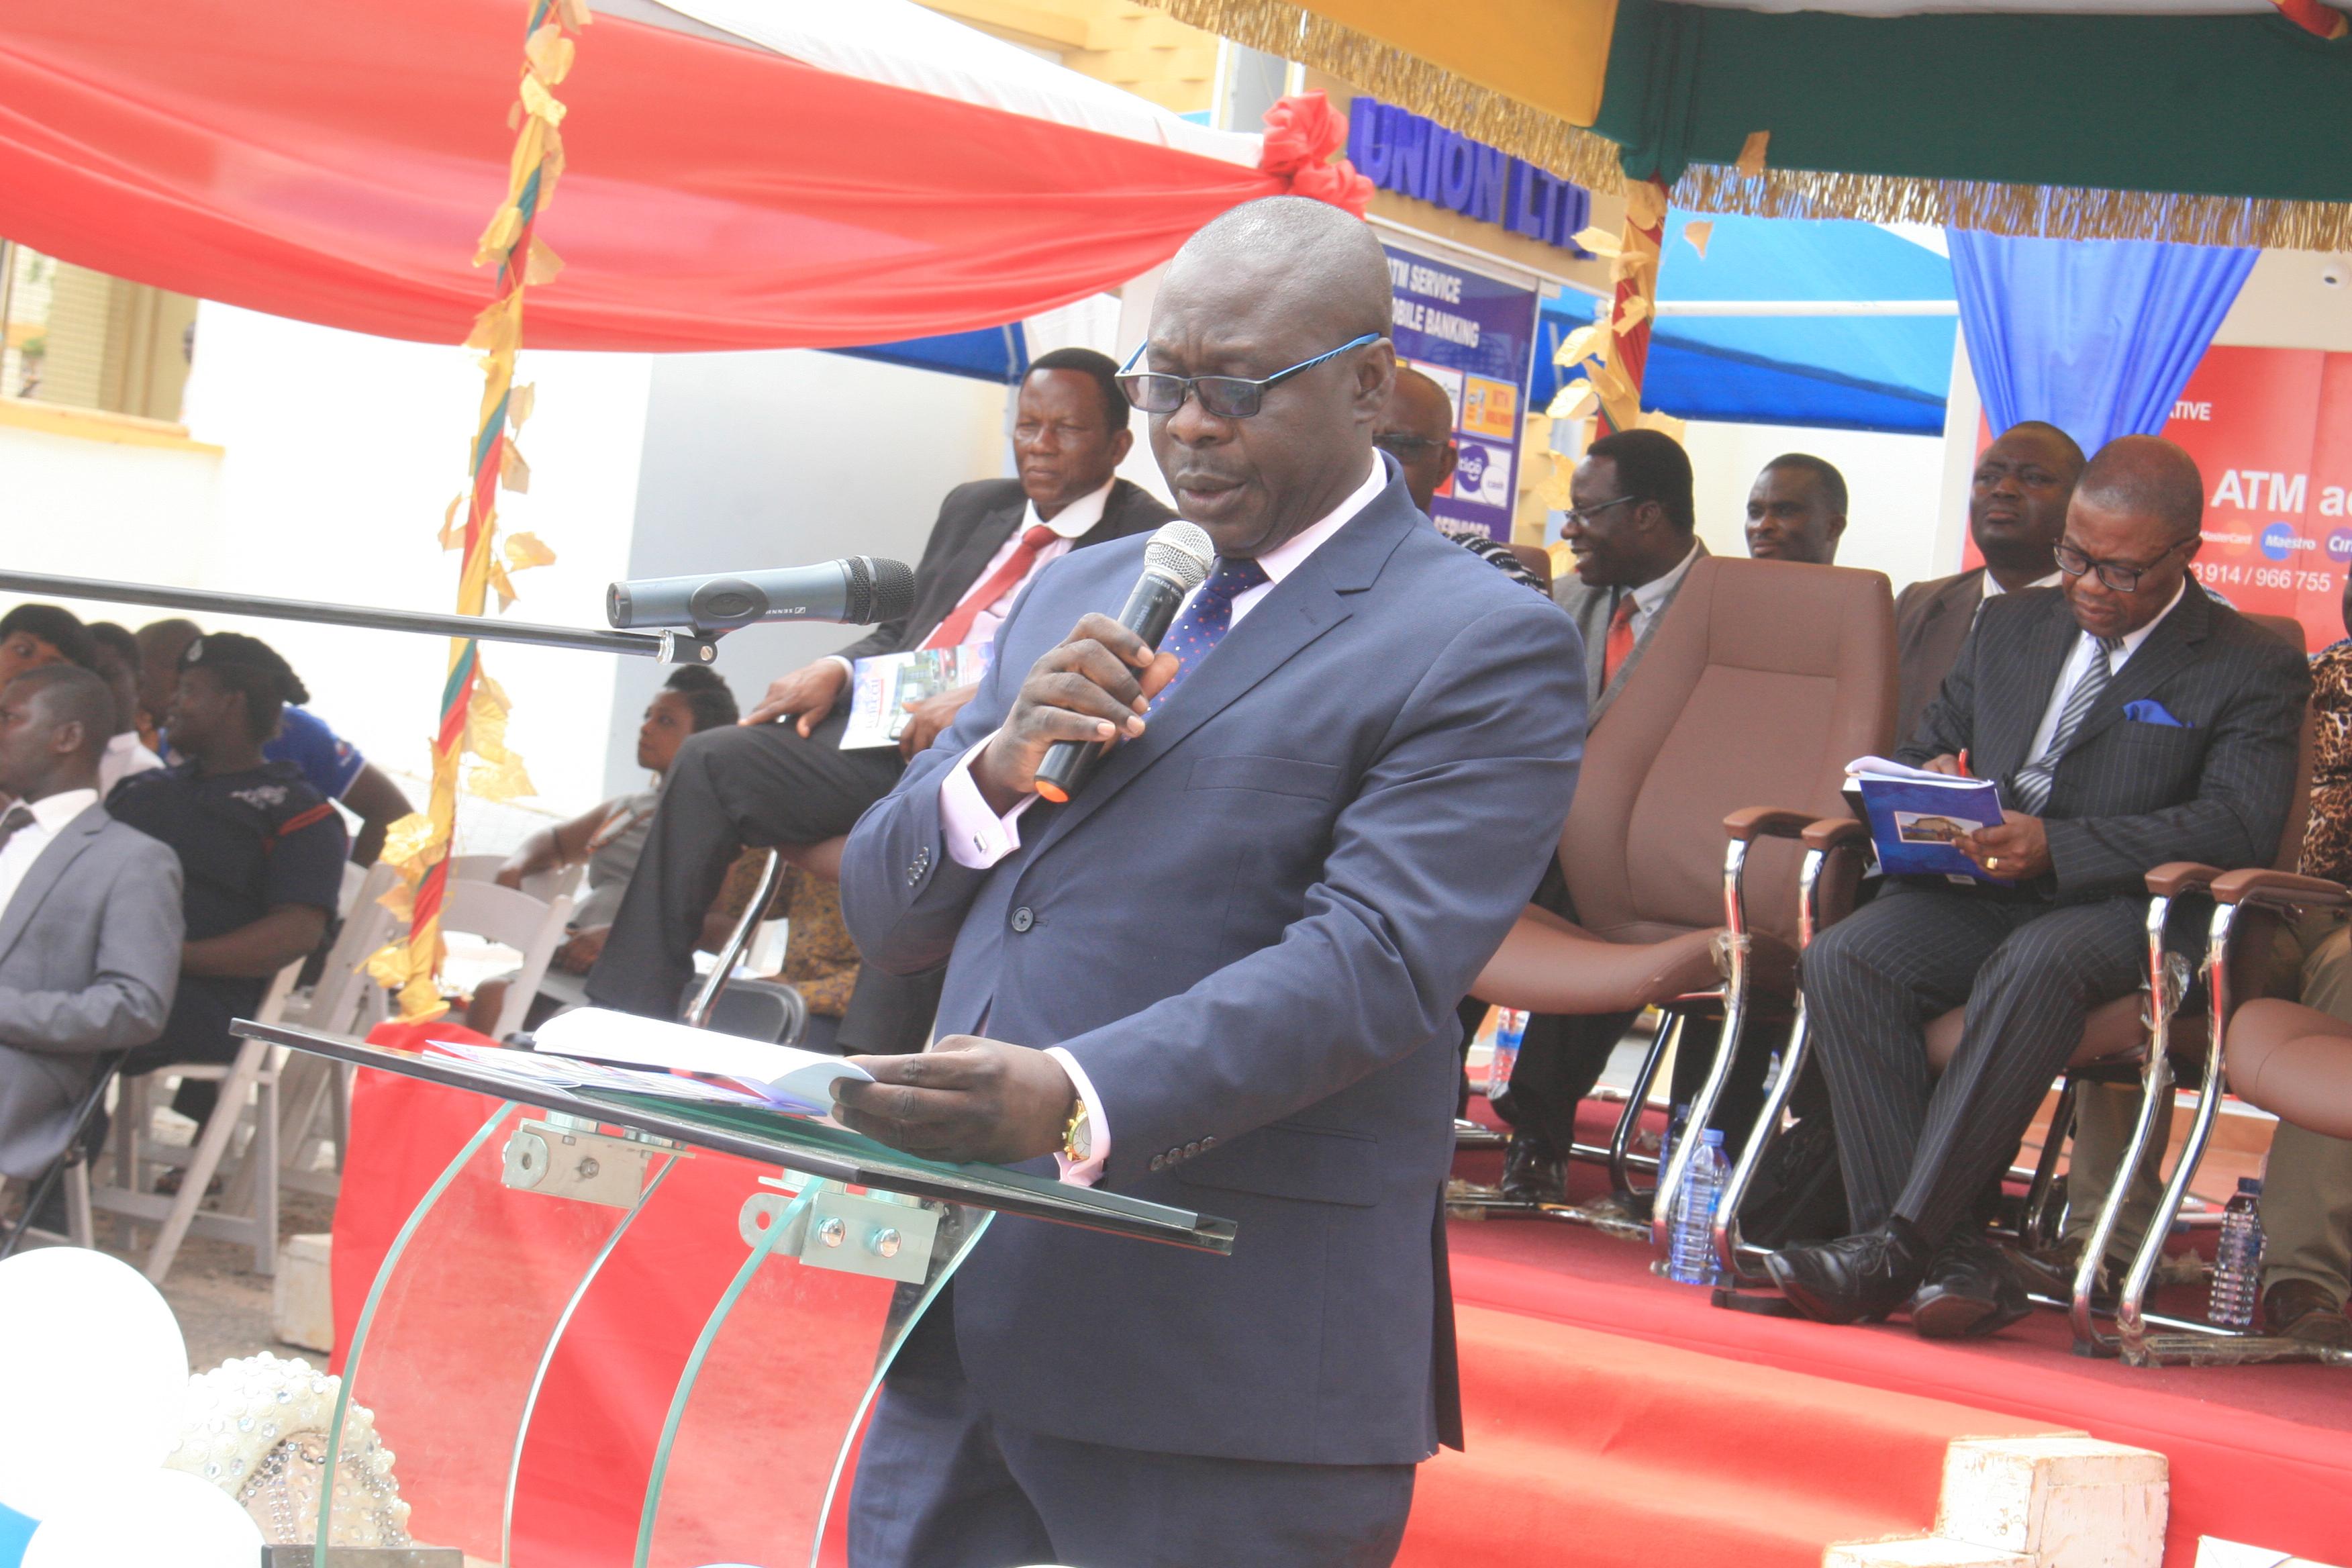 WELCOME ADDRESS--DR FRANK ANKOBEA (PRESIDENT OF GHANA MEDICAL ASSOCIATION/ VICE CHAIRMAN, KATHCCU)